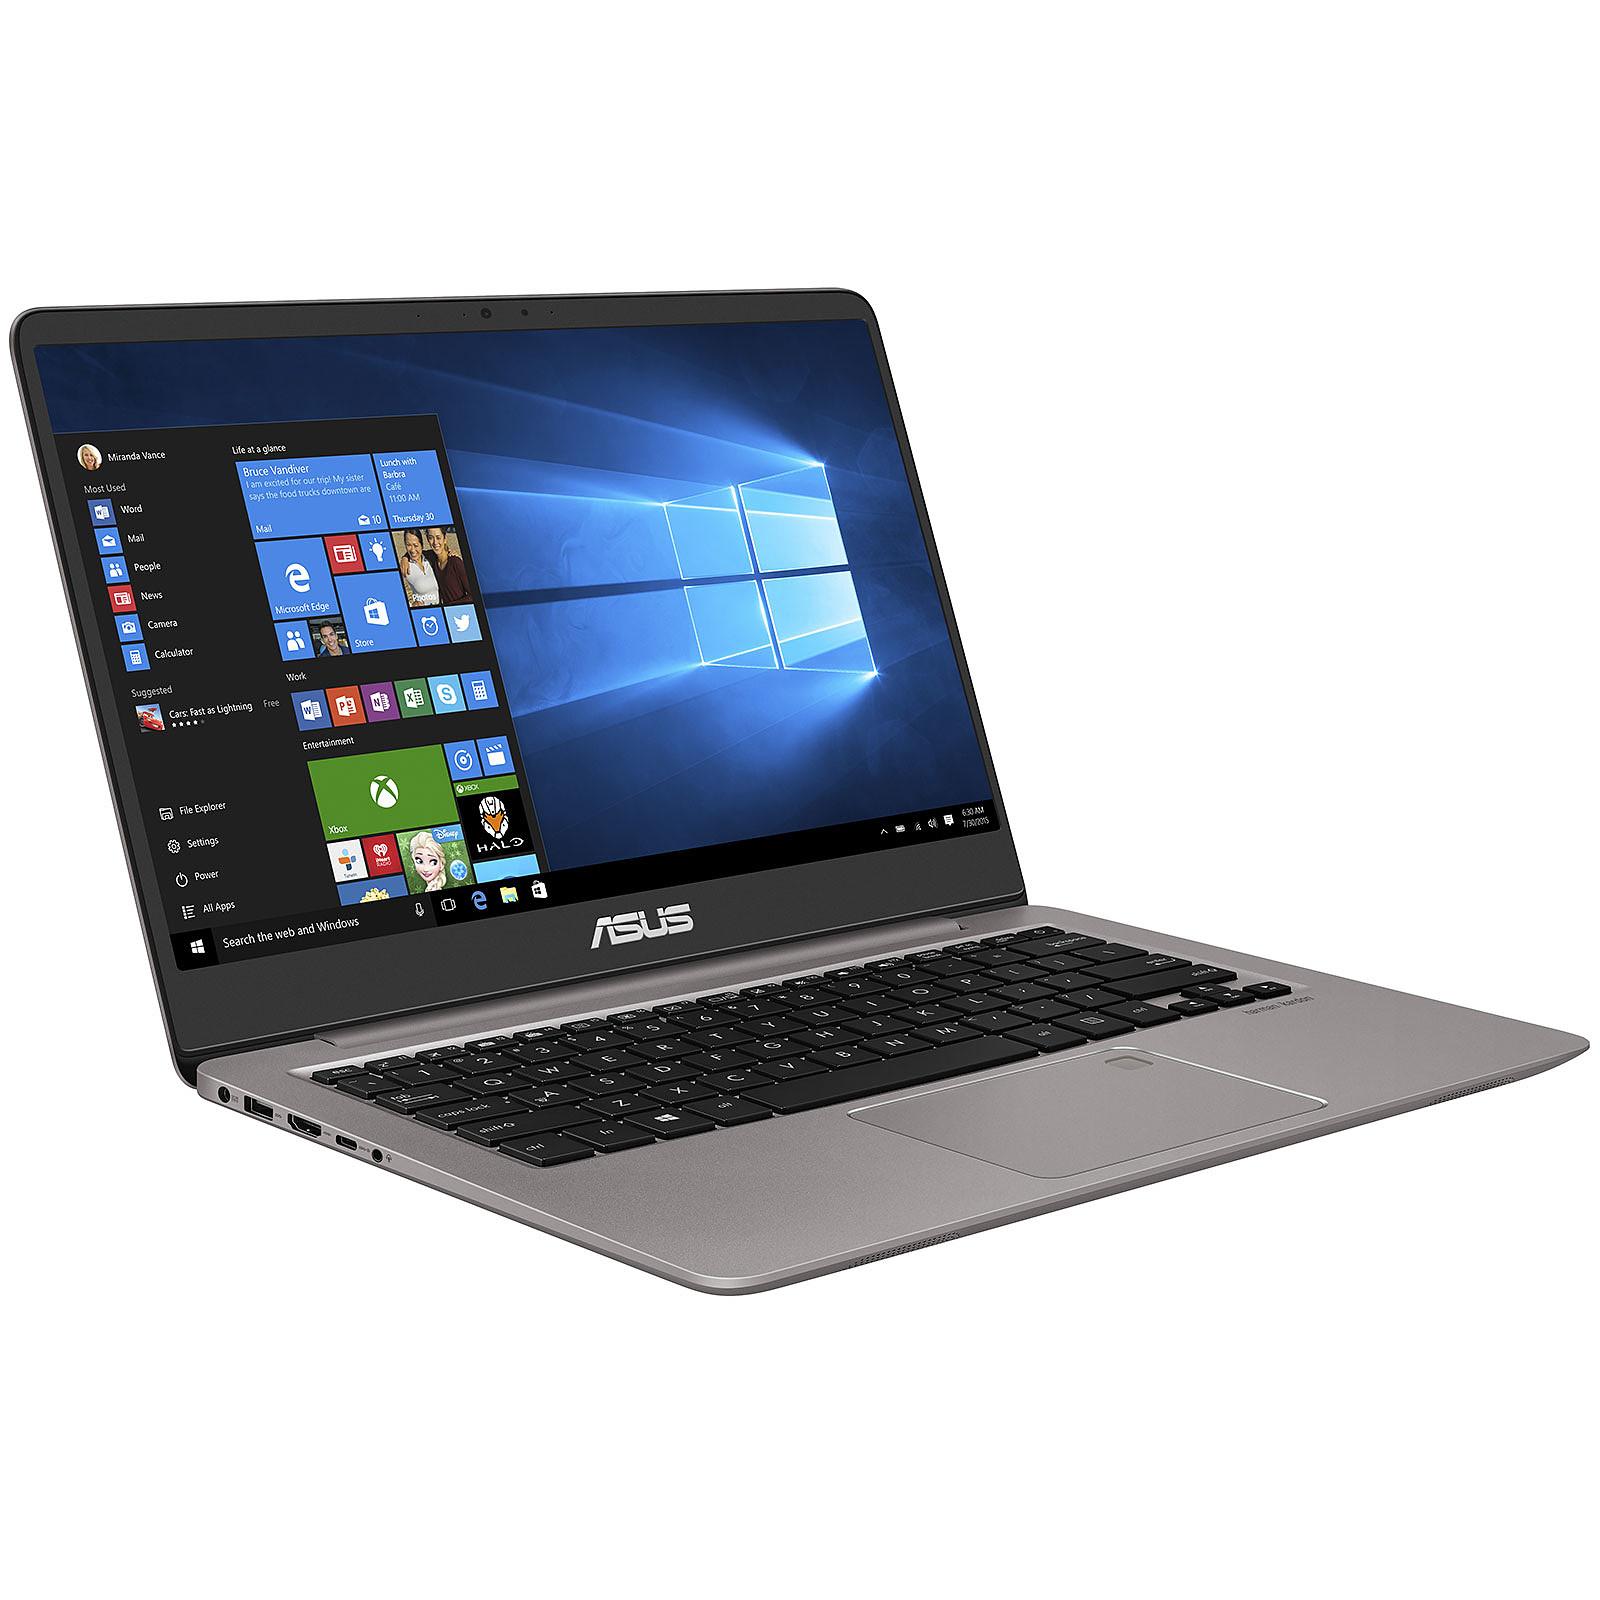 ASUS Zenbook UX410UA-GV352R